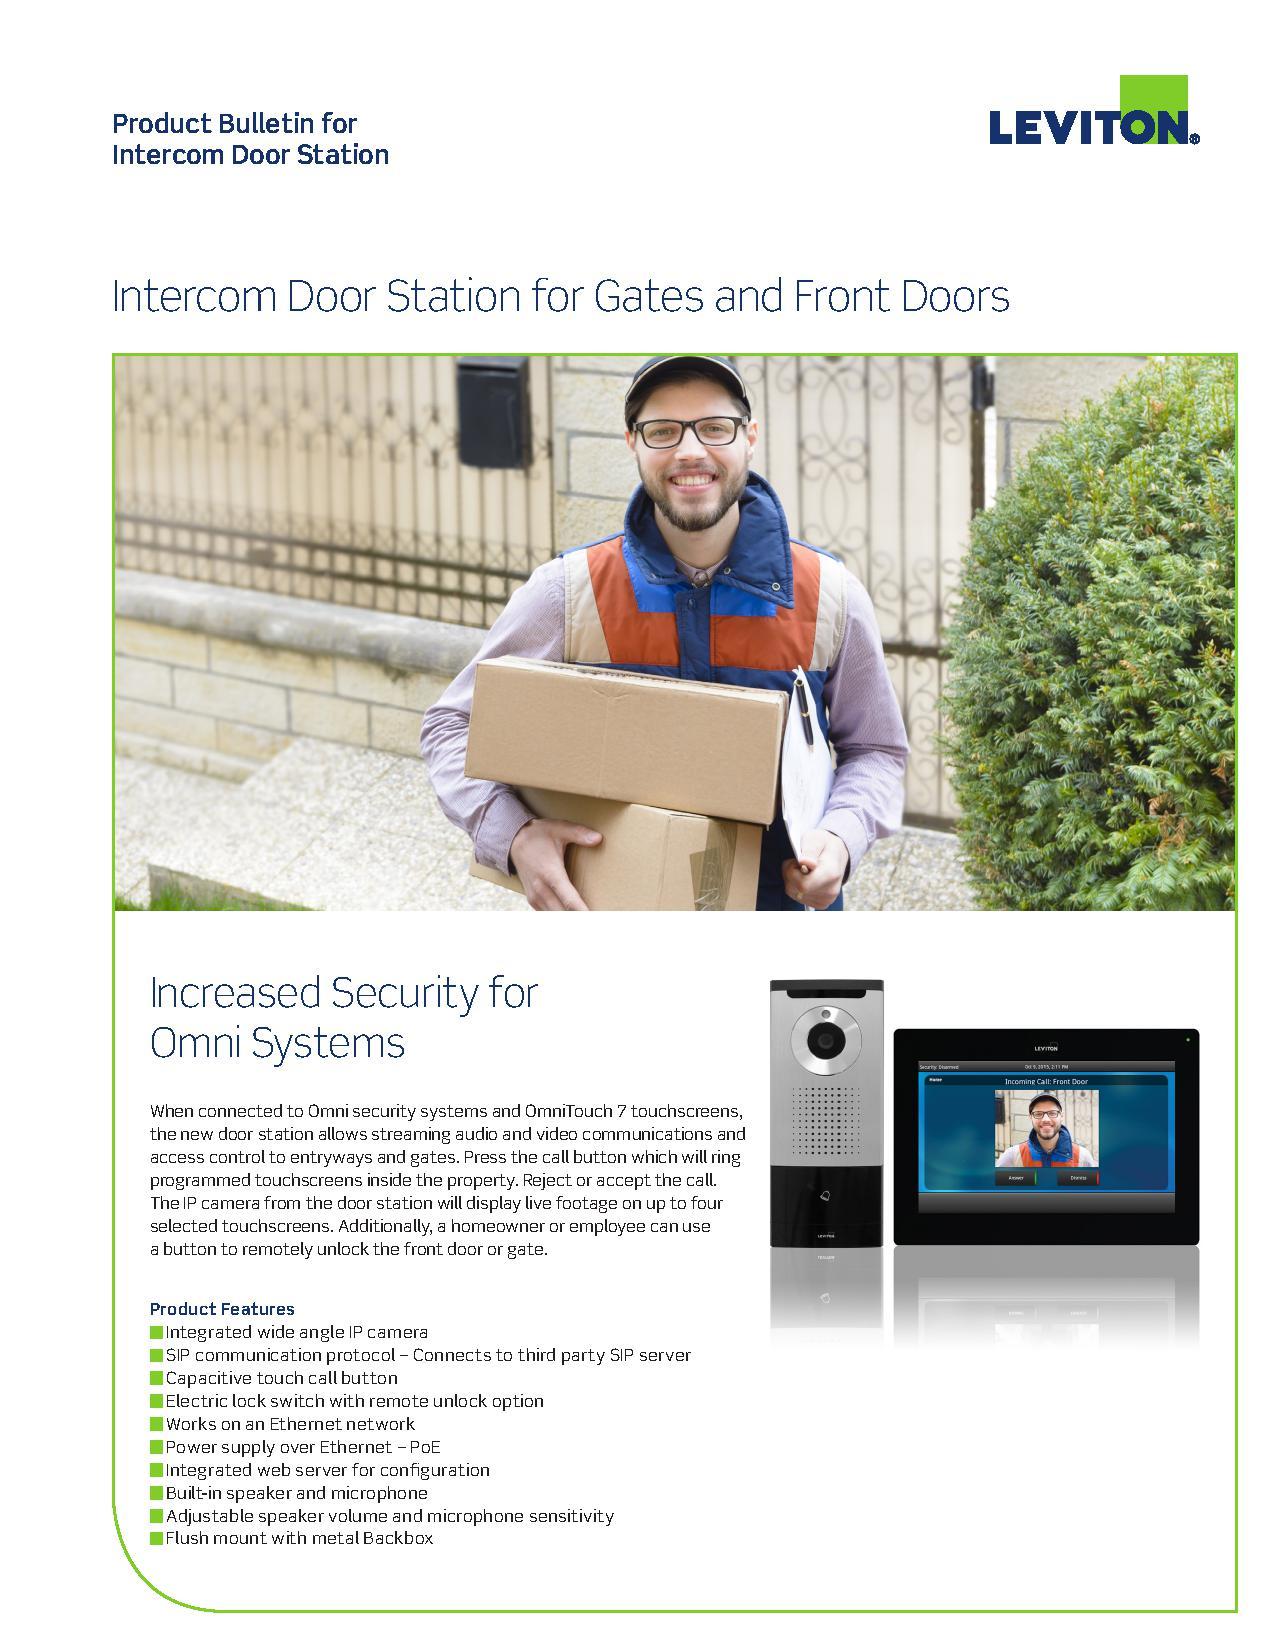 Leviton INDS1 Door Station for Lumina Gateway | AJB Sales